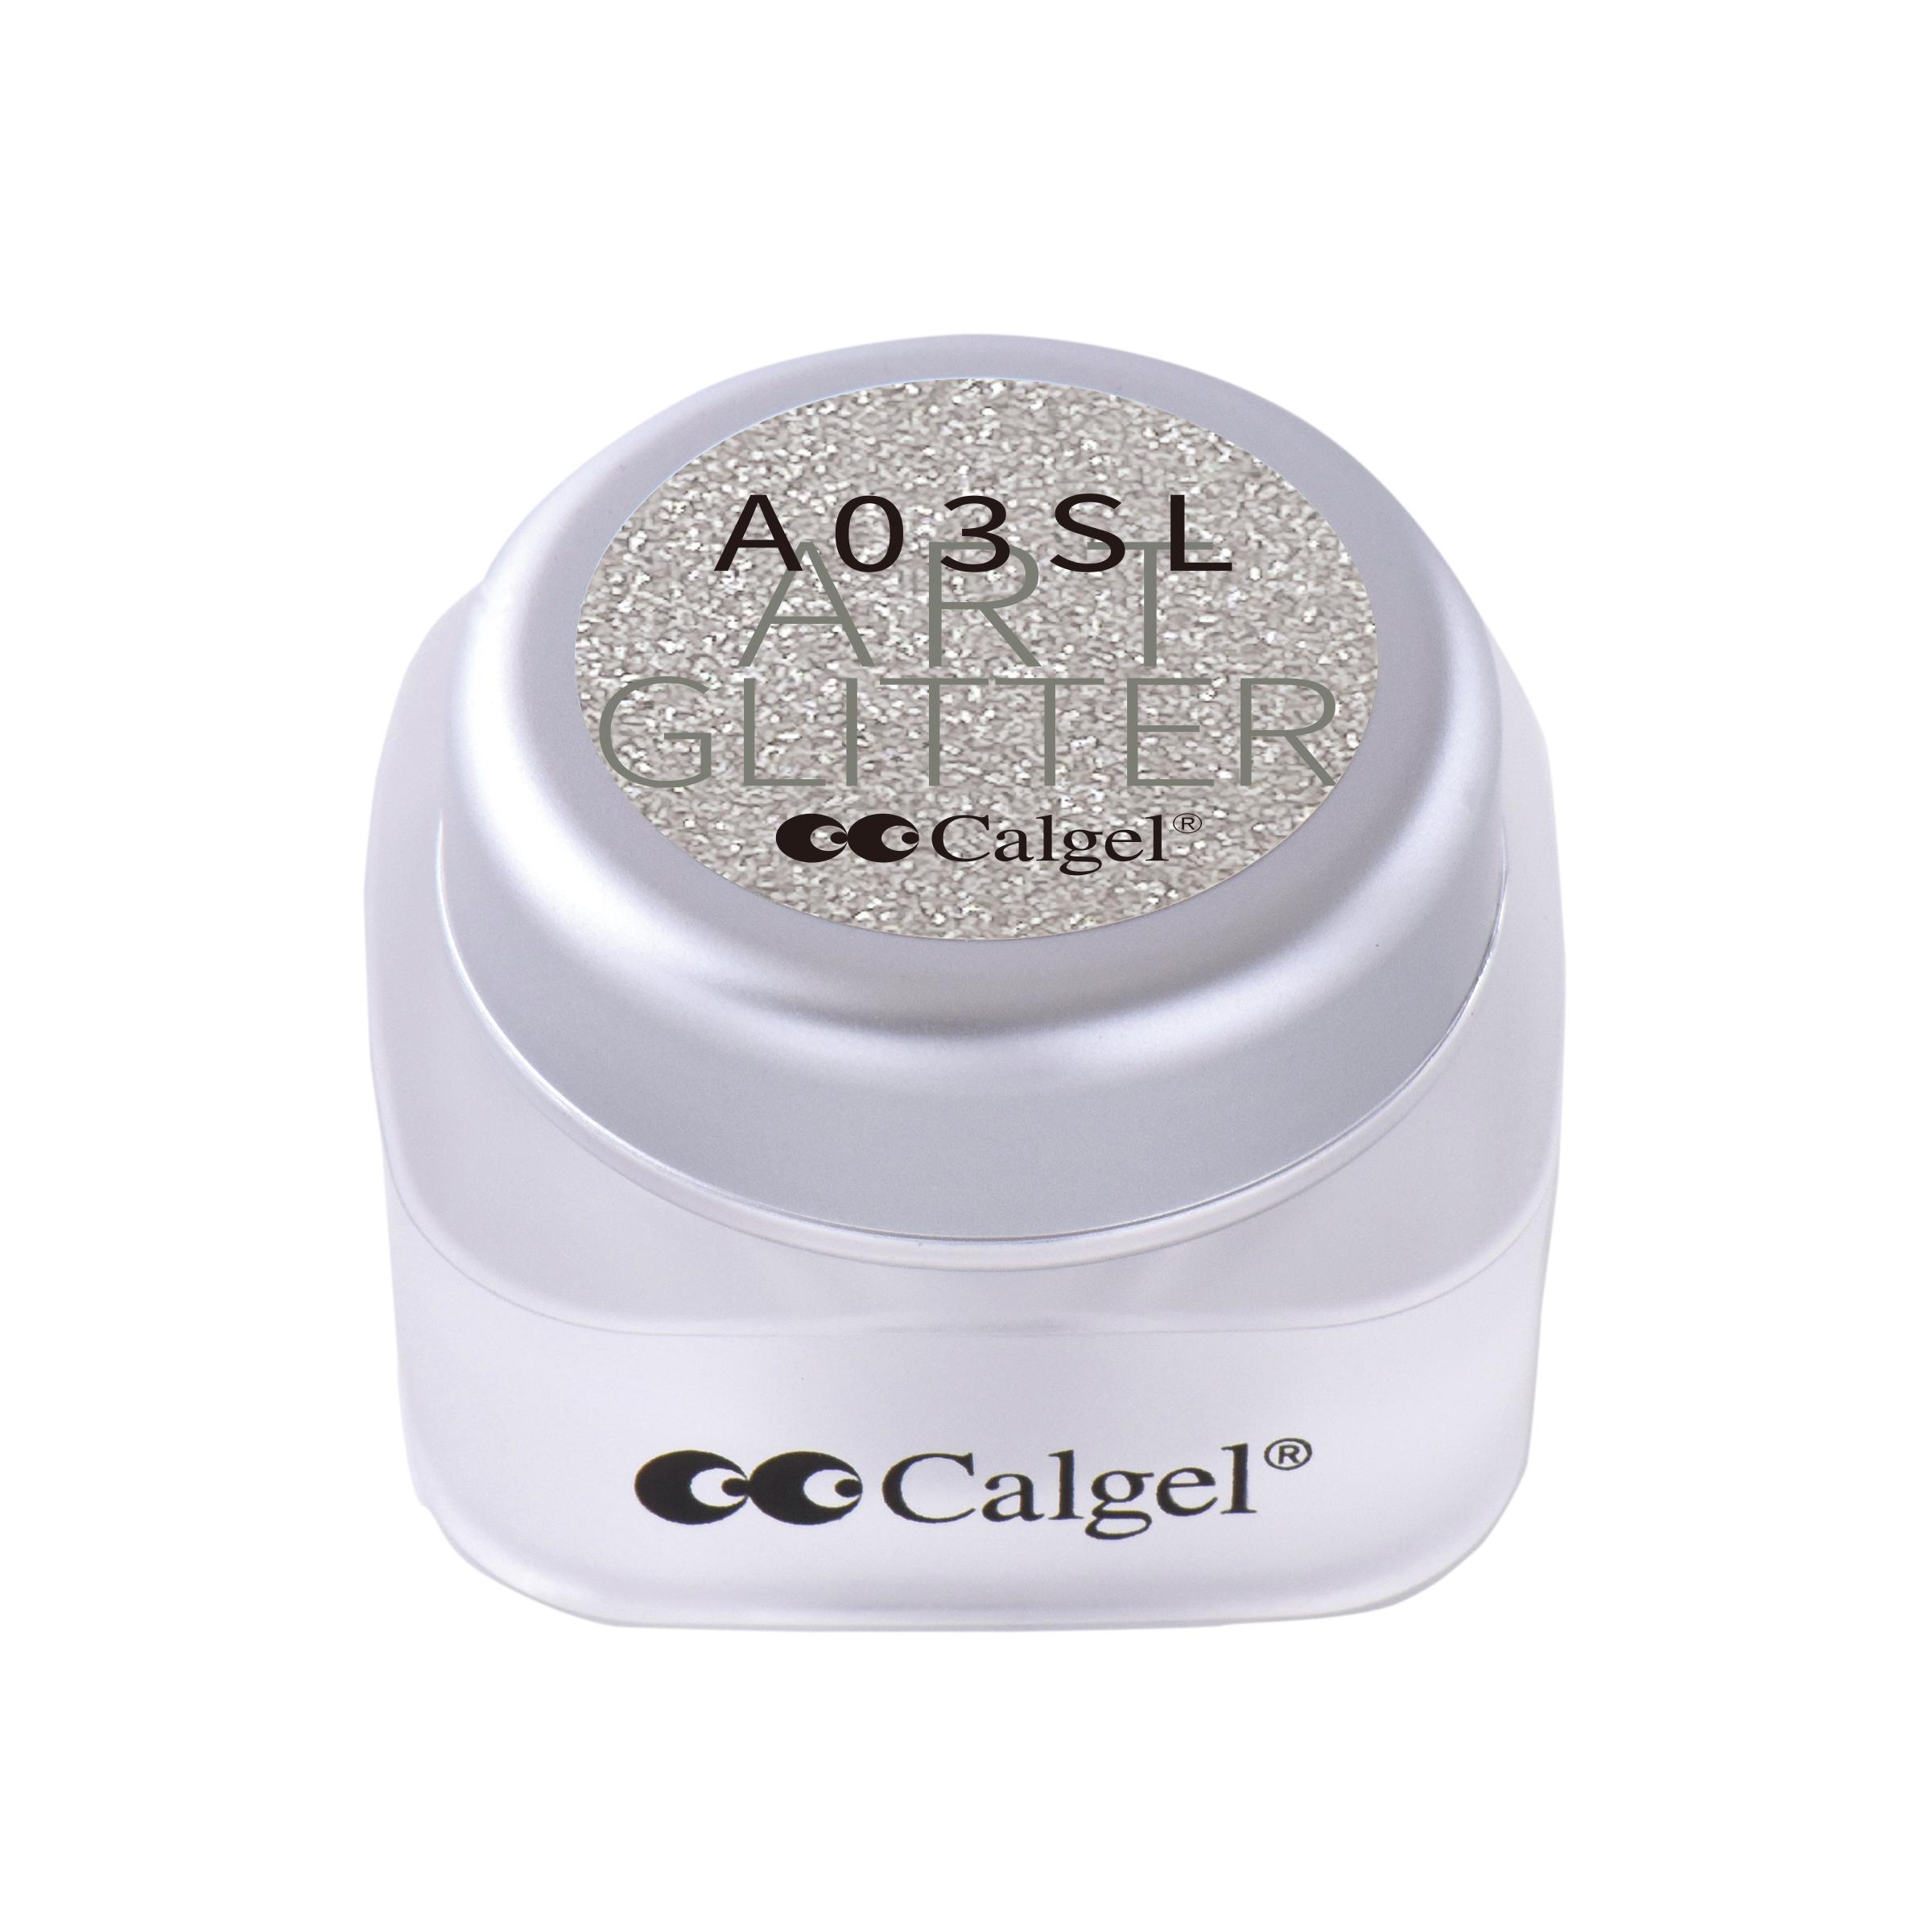 CGA03SL カラーカルジェル プラス アート グリッター シルバー